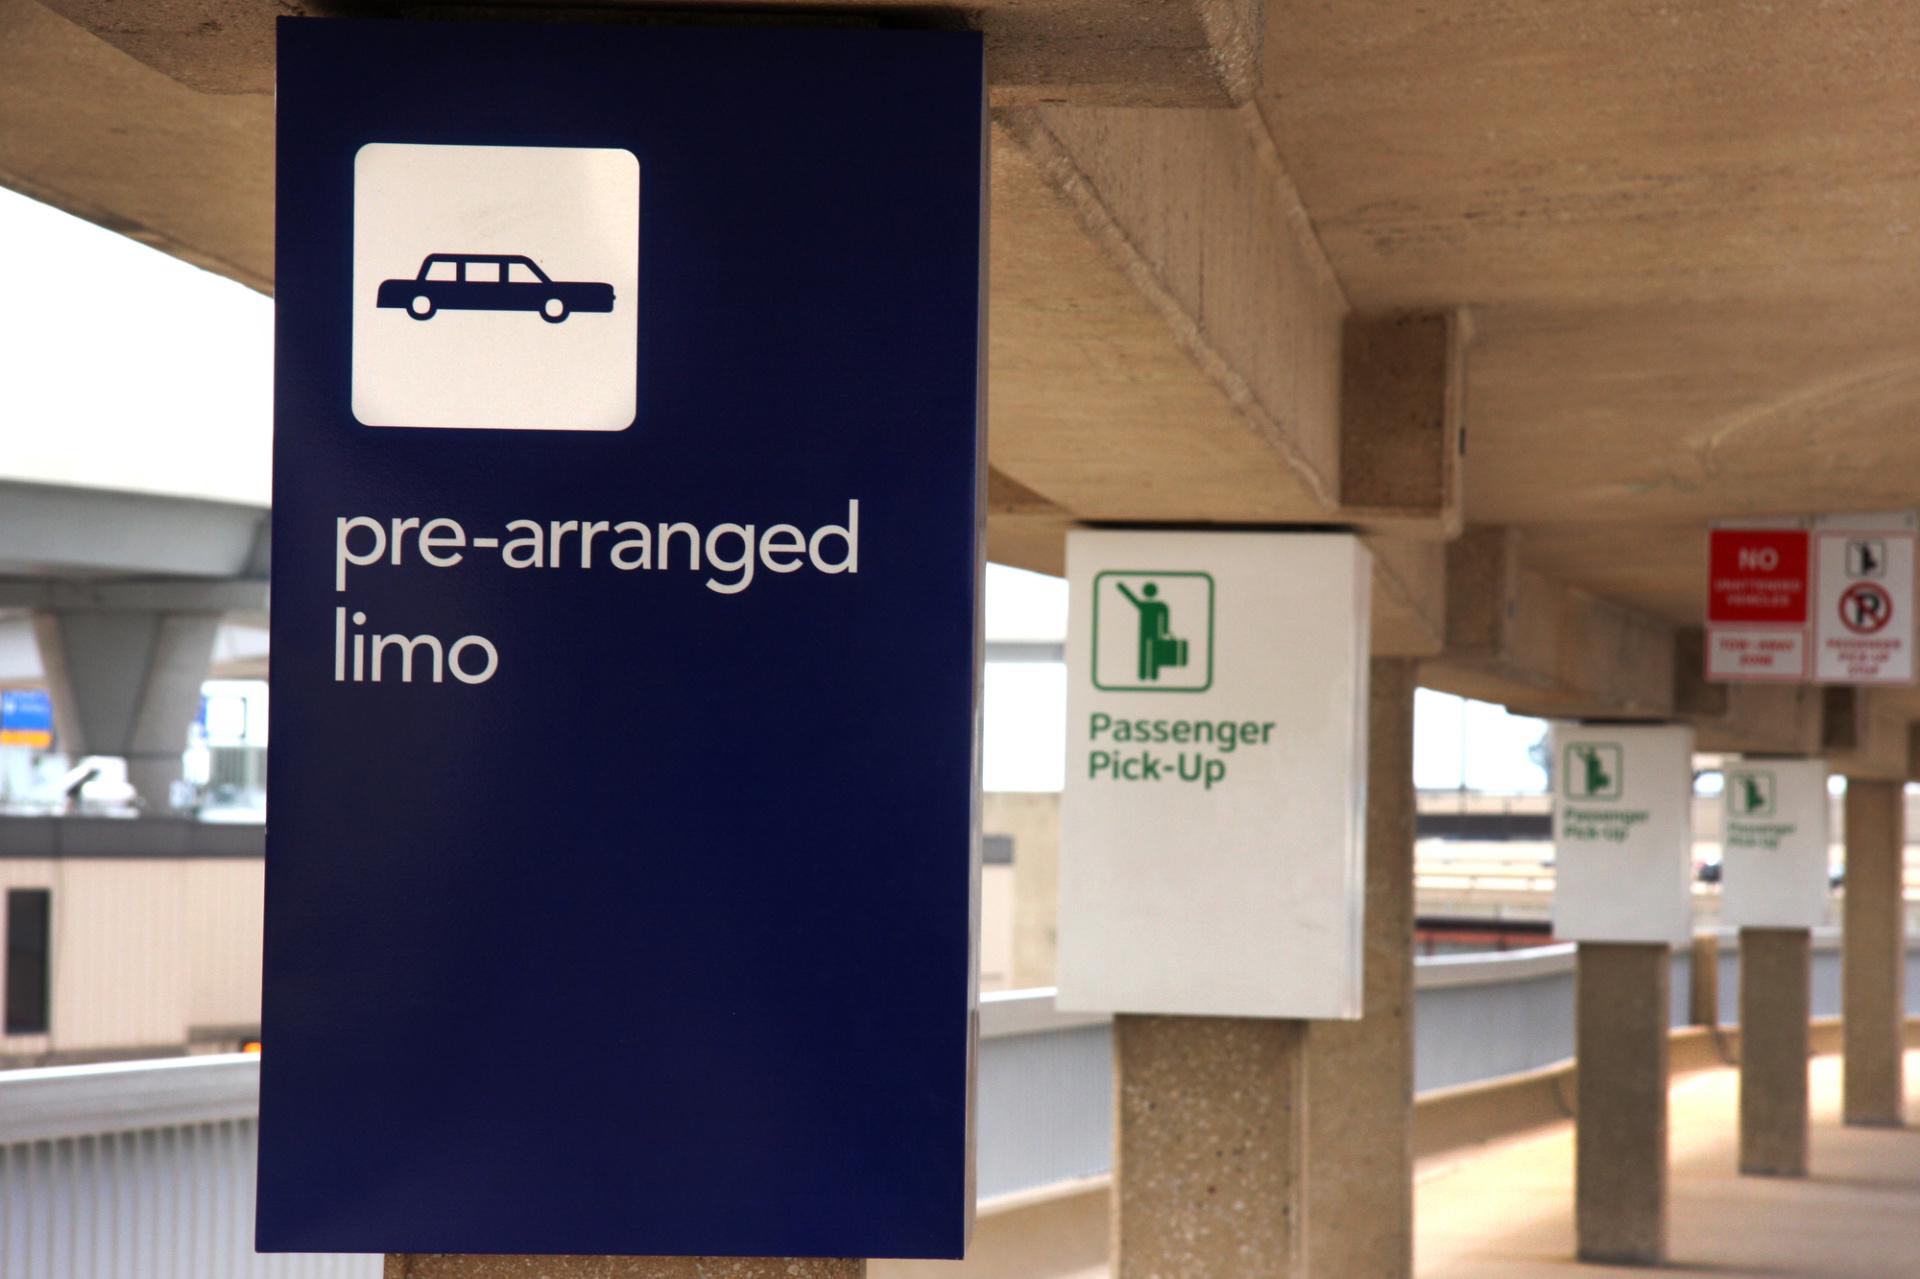 Airport Limo Pre Arrange Services  www.torontoairportslimousine.com